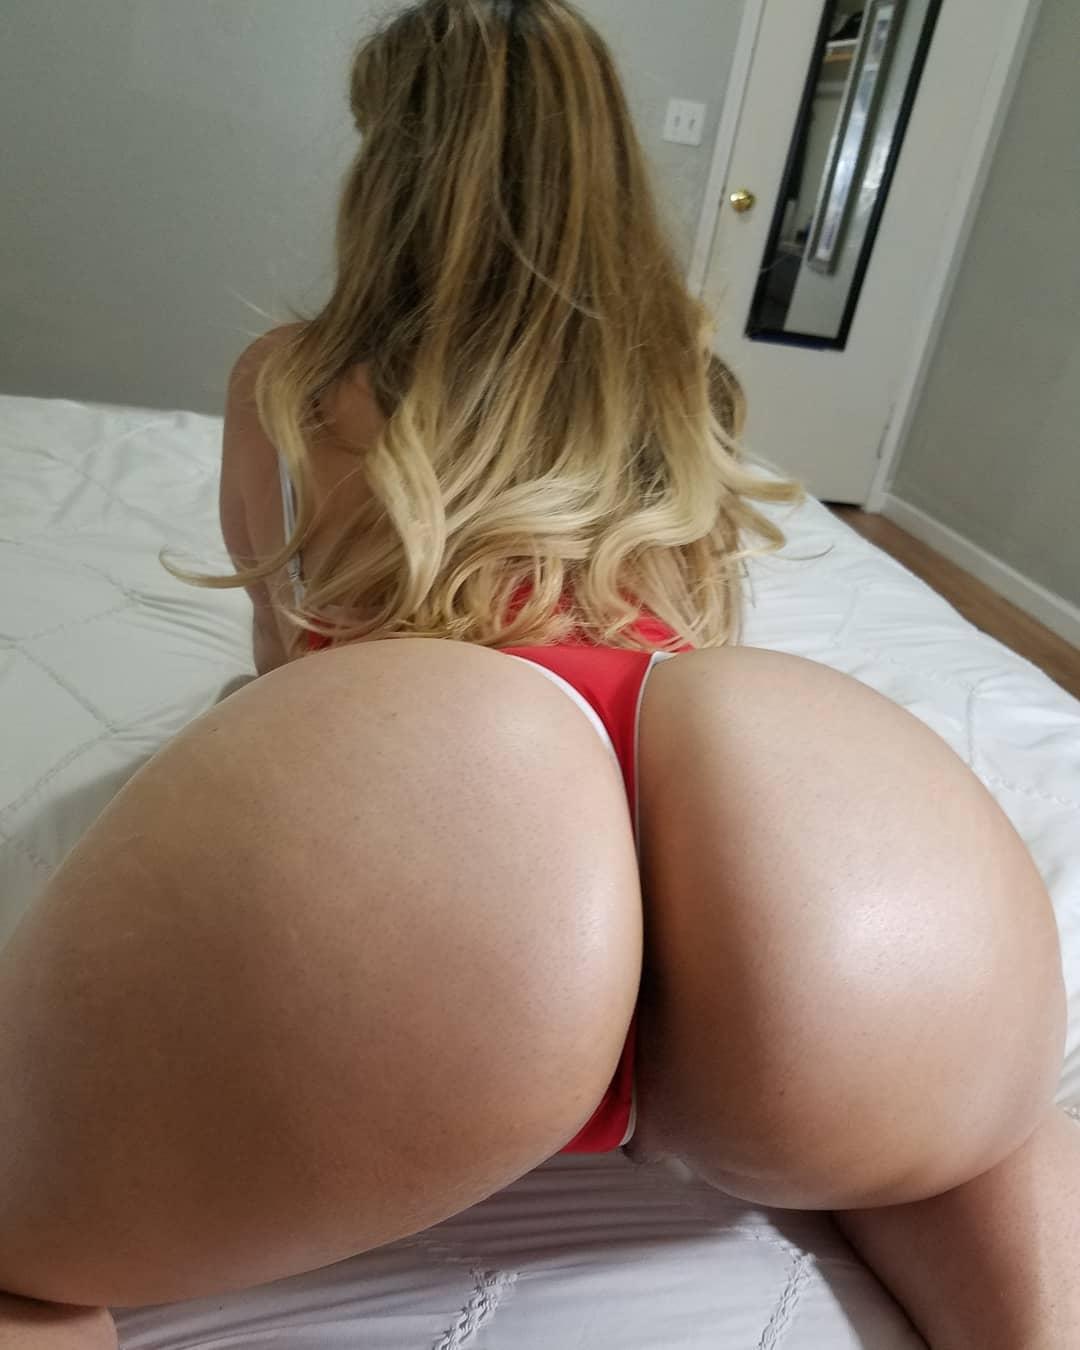 Boricuabootyy Nude & Sex Tape Onlyfans Leaked! 0012